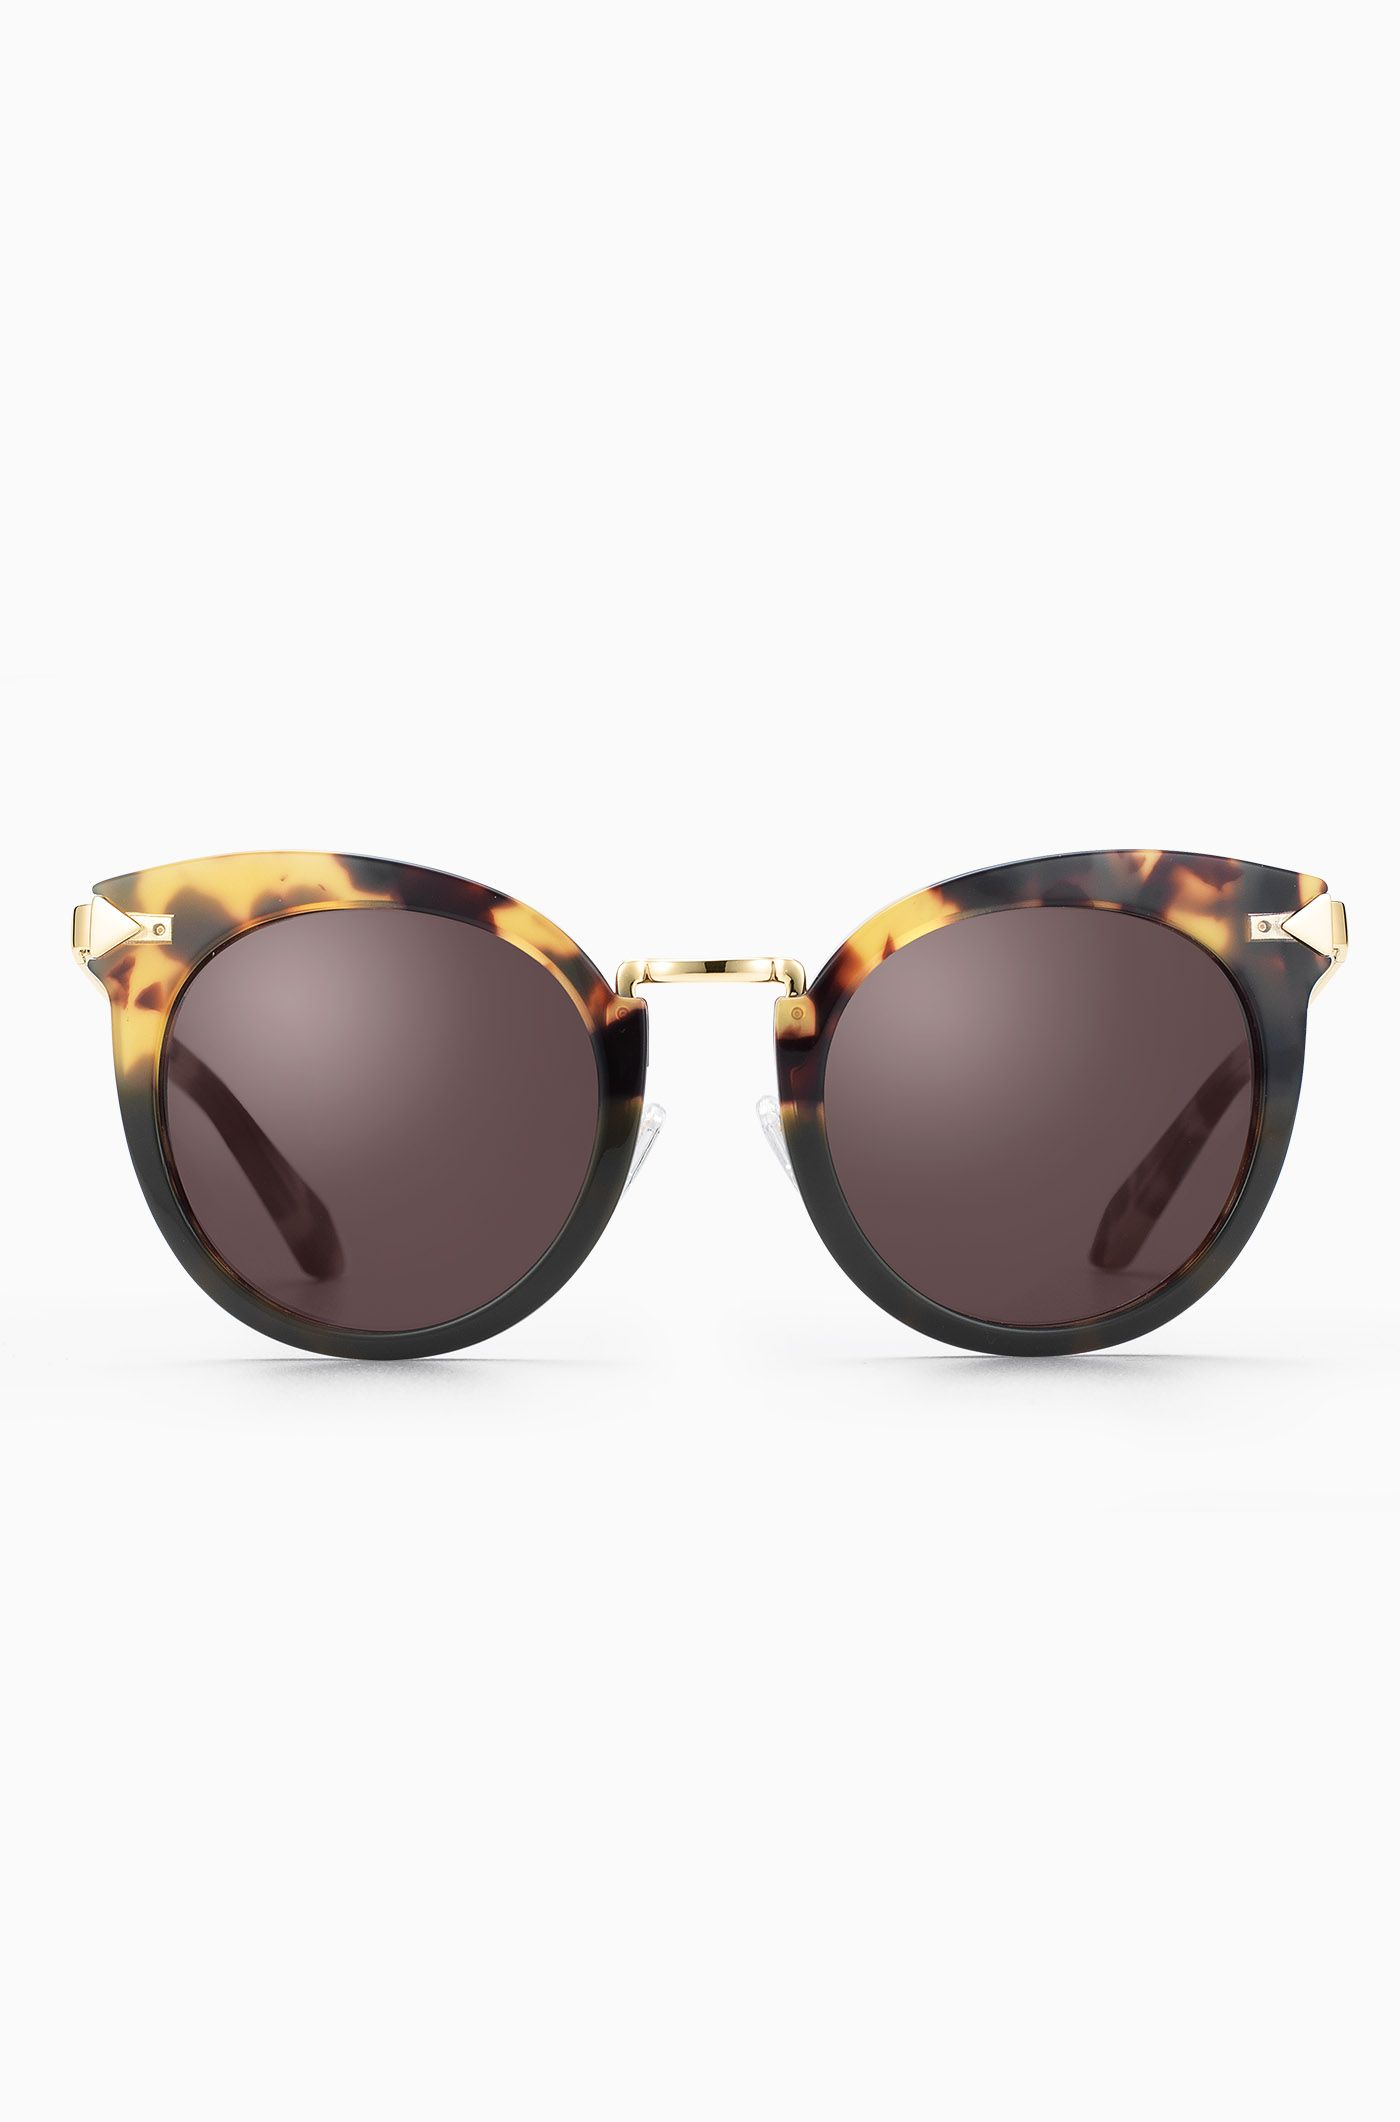 Wesley Sunglasses - Tortoise Www.stelladot.com jessicanbrzys ... 64bb05ff7c